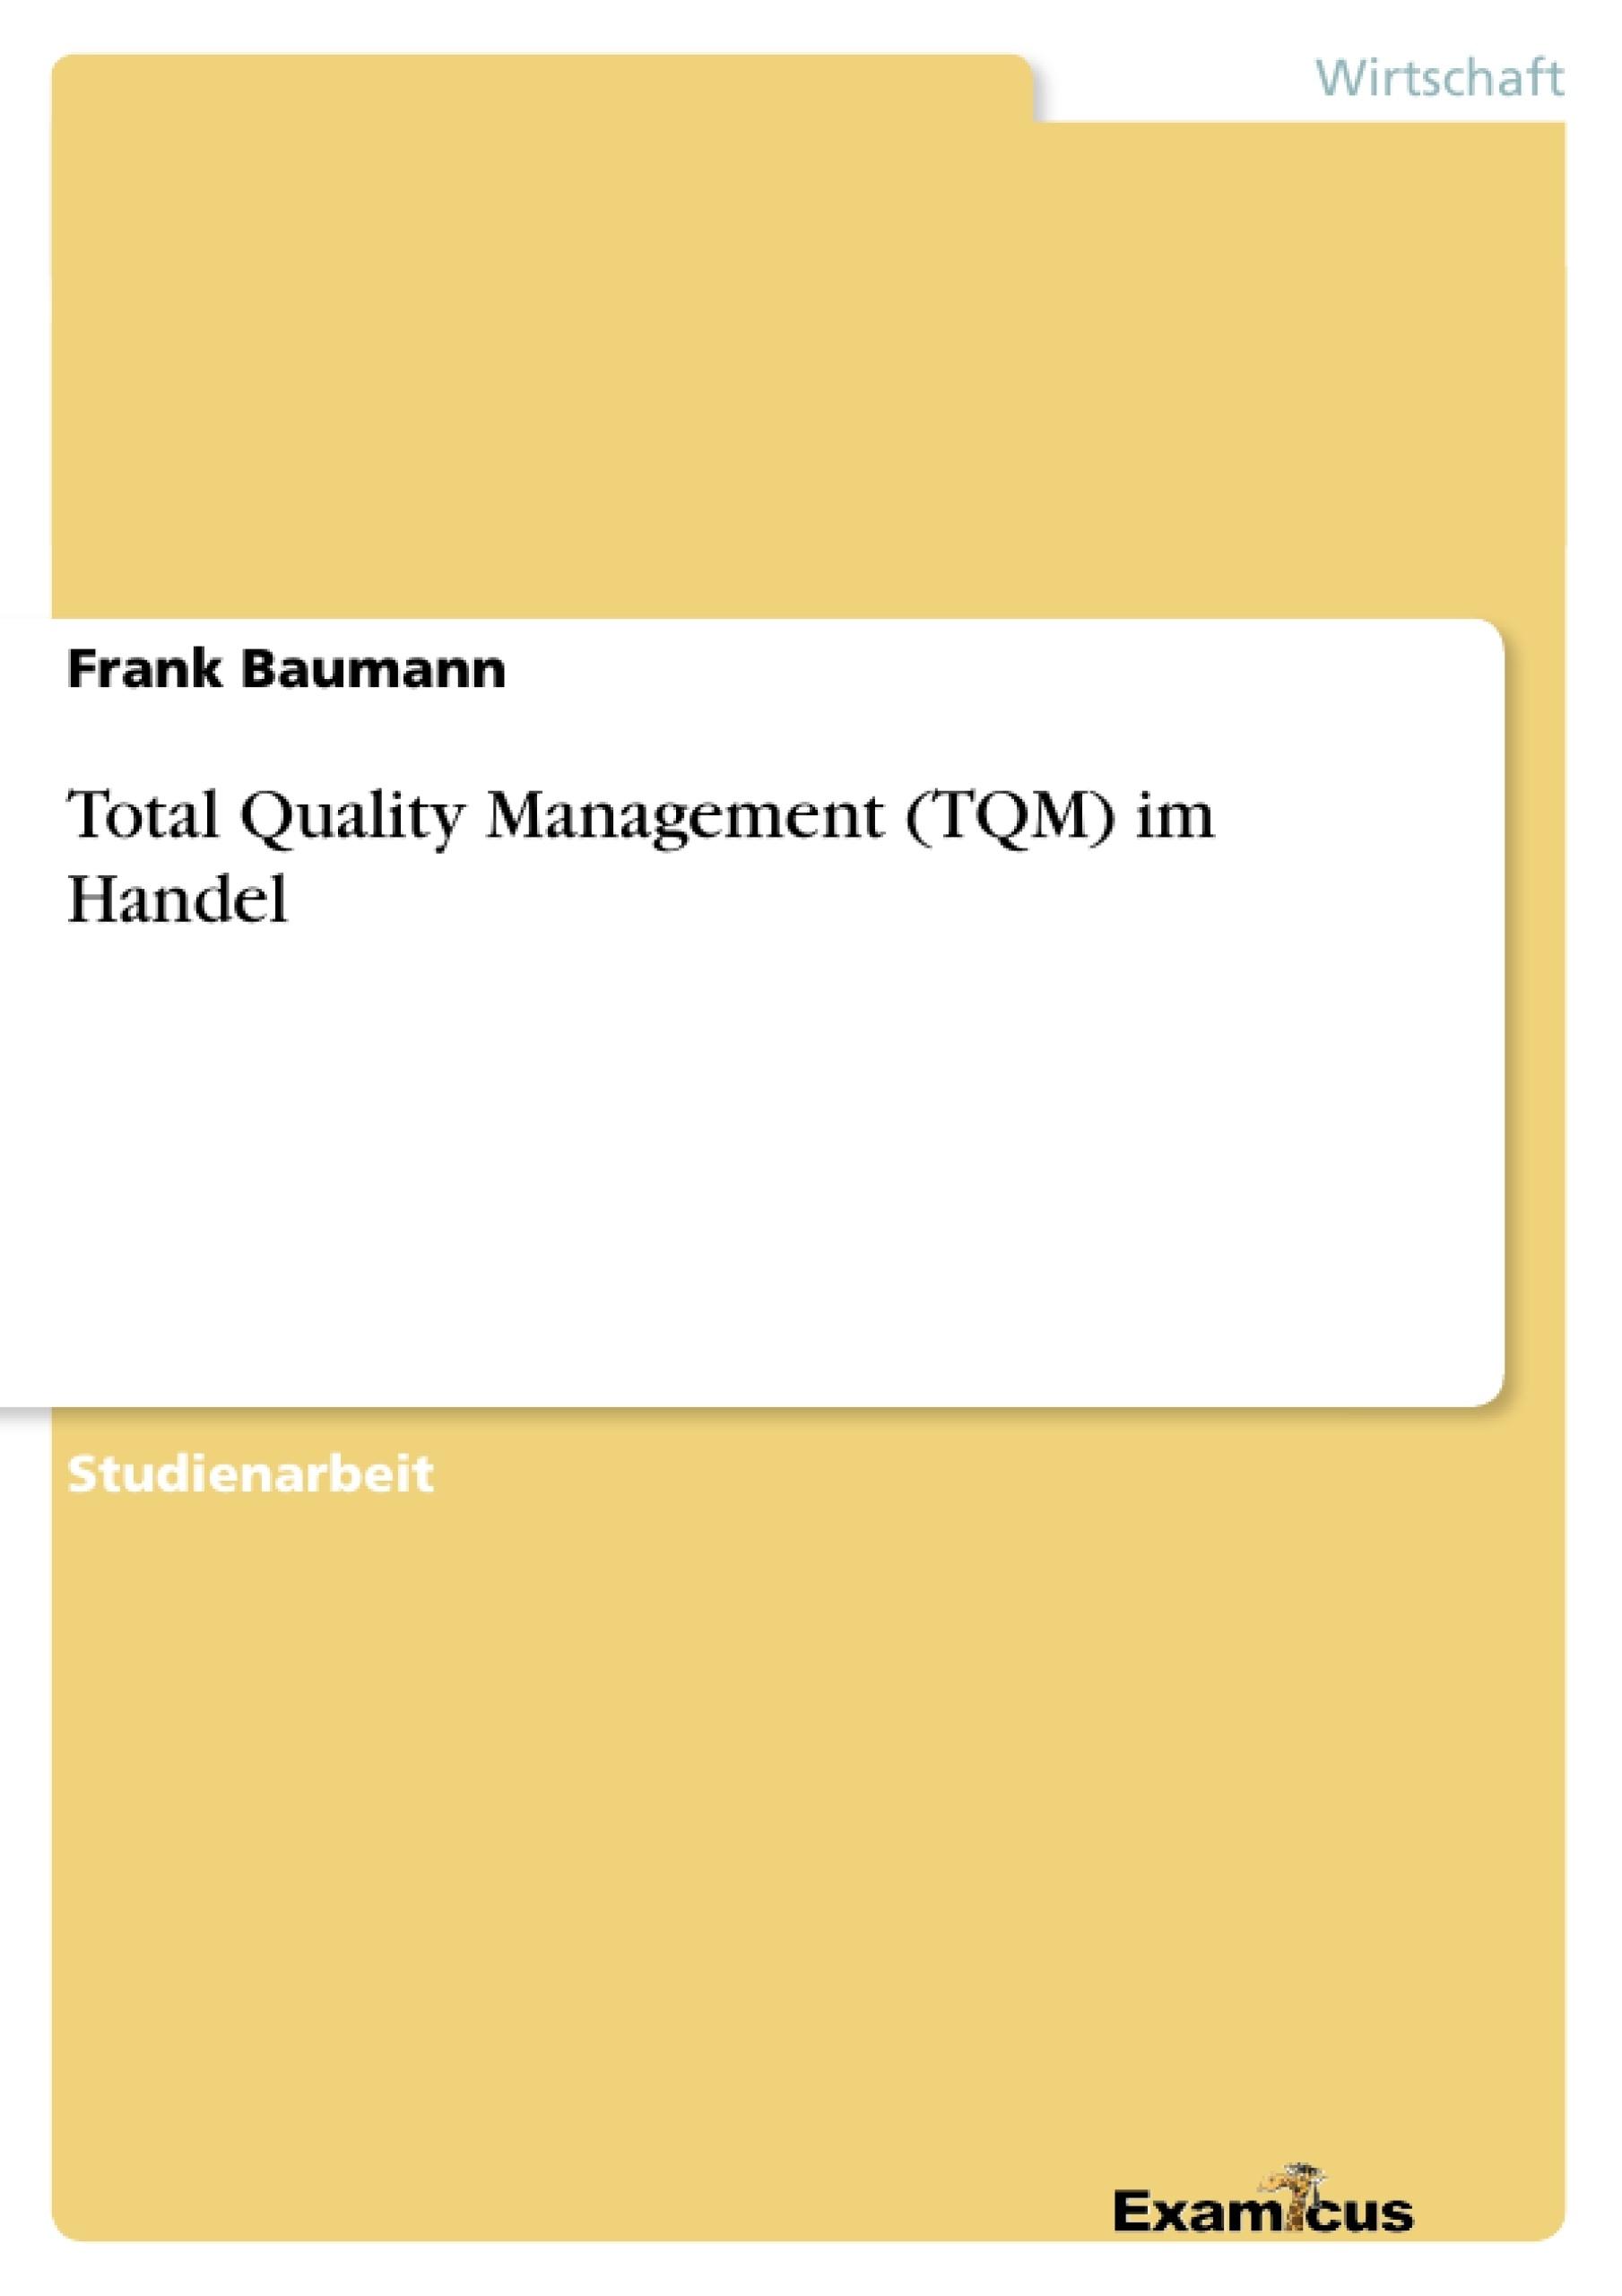 Titel: Total Quality Management (TQM) im Handel